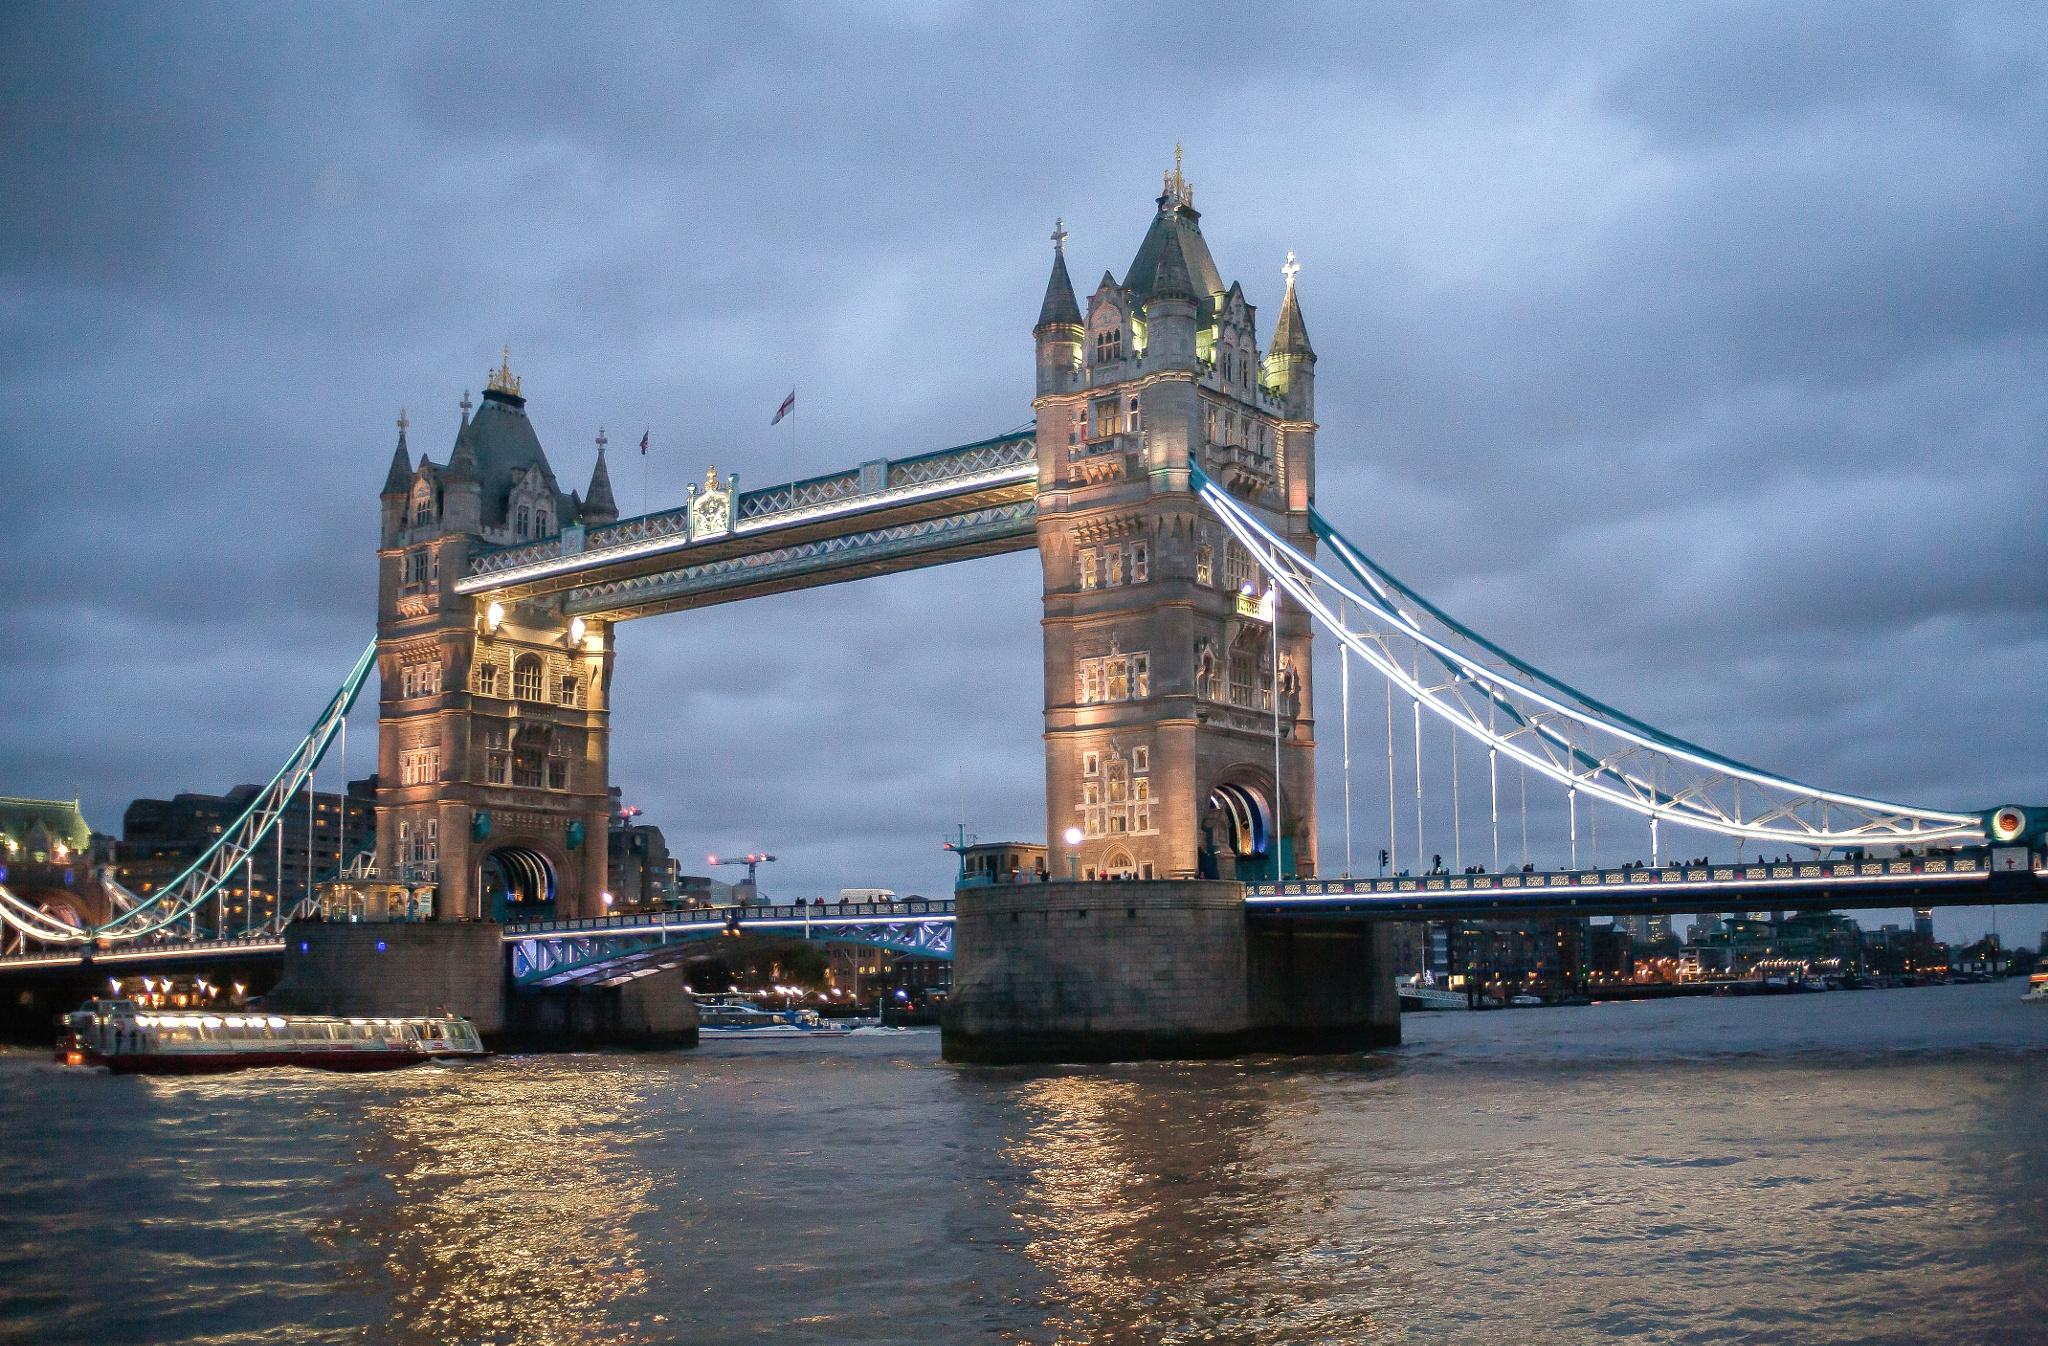 Tower Bridge by Philip Cooper